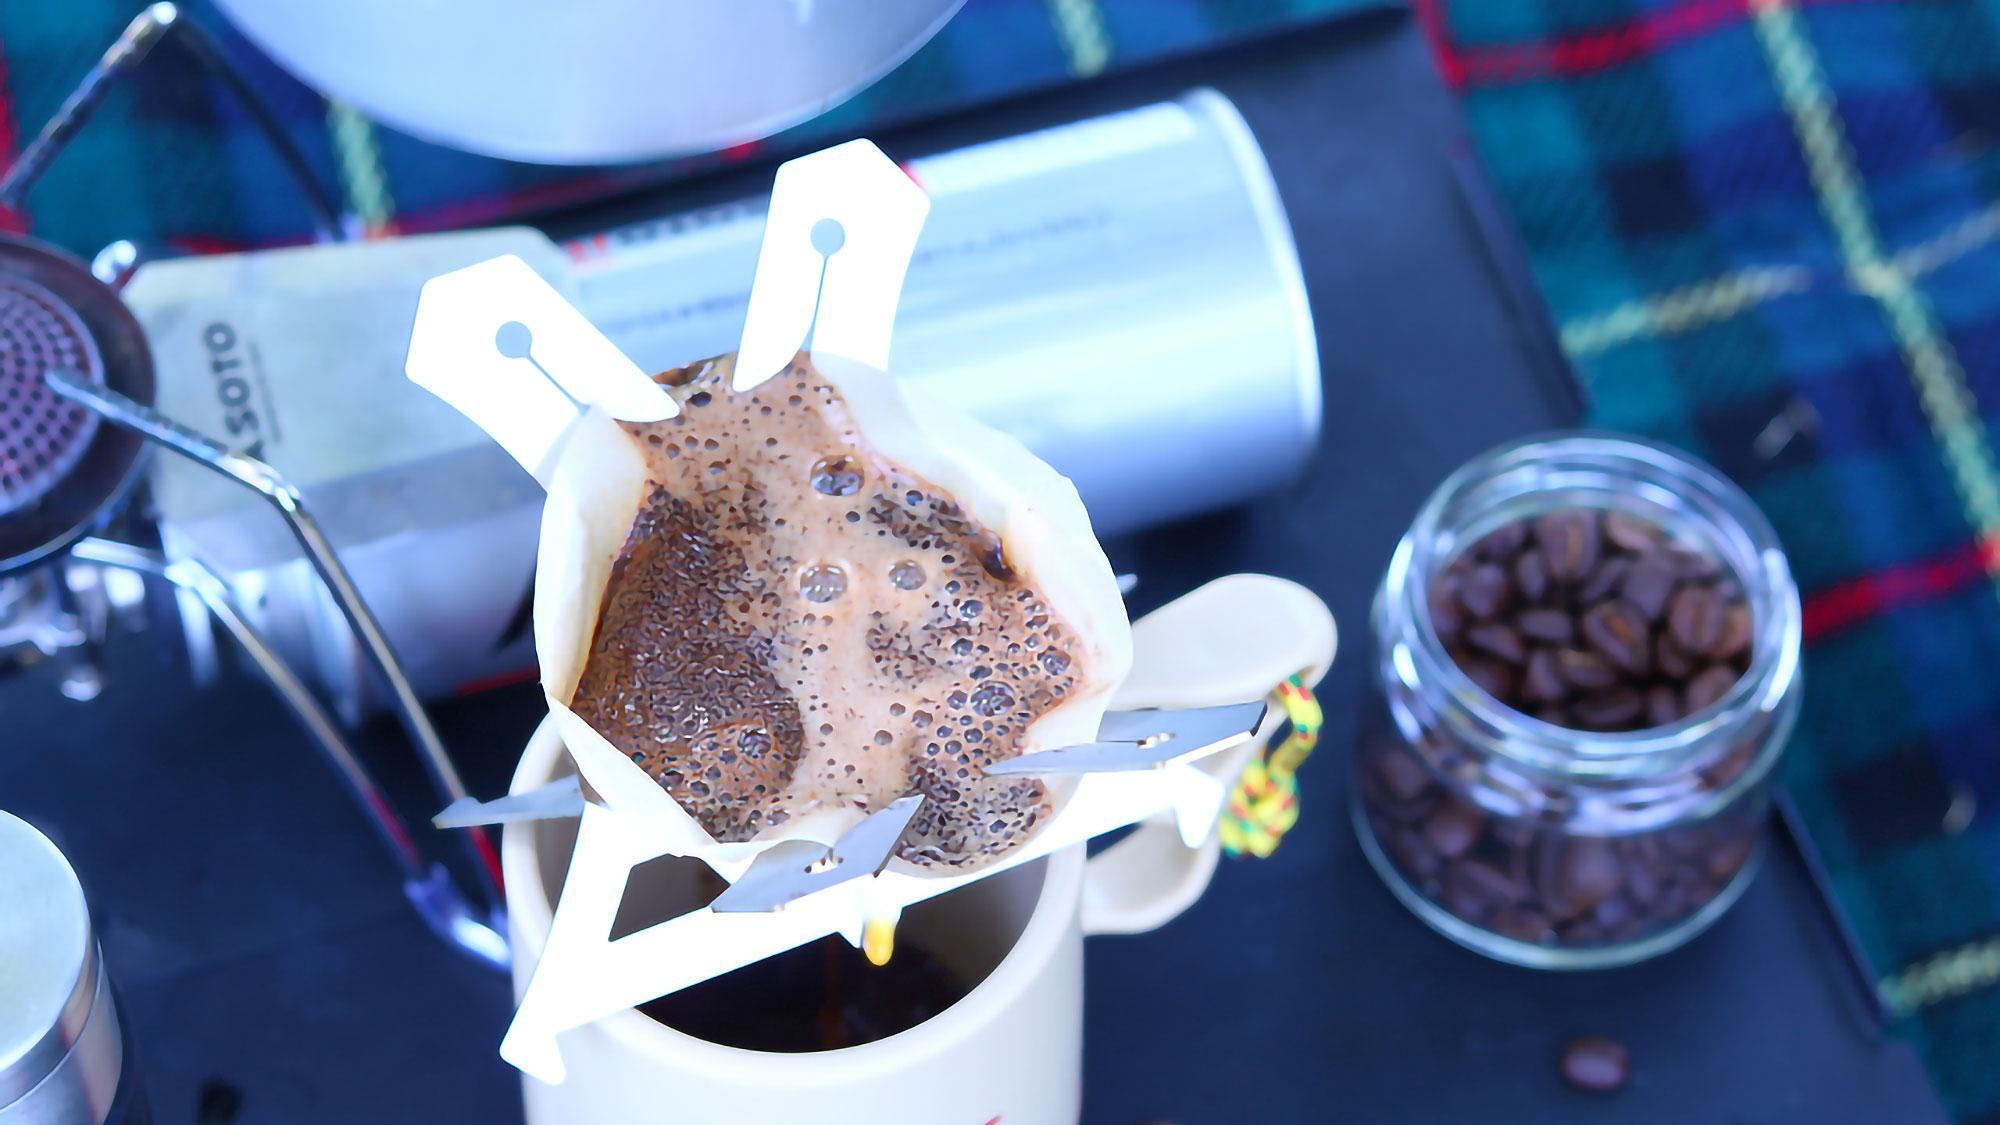 Pelican Coffee Dripper by Katori Seisakusho